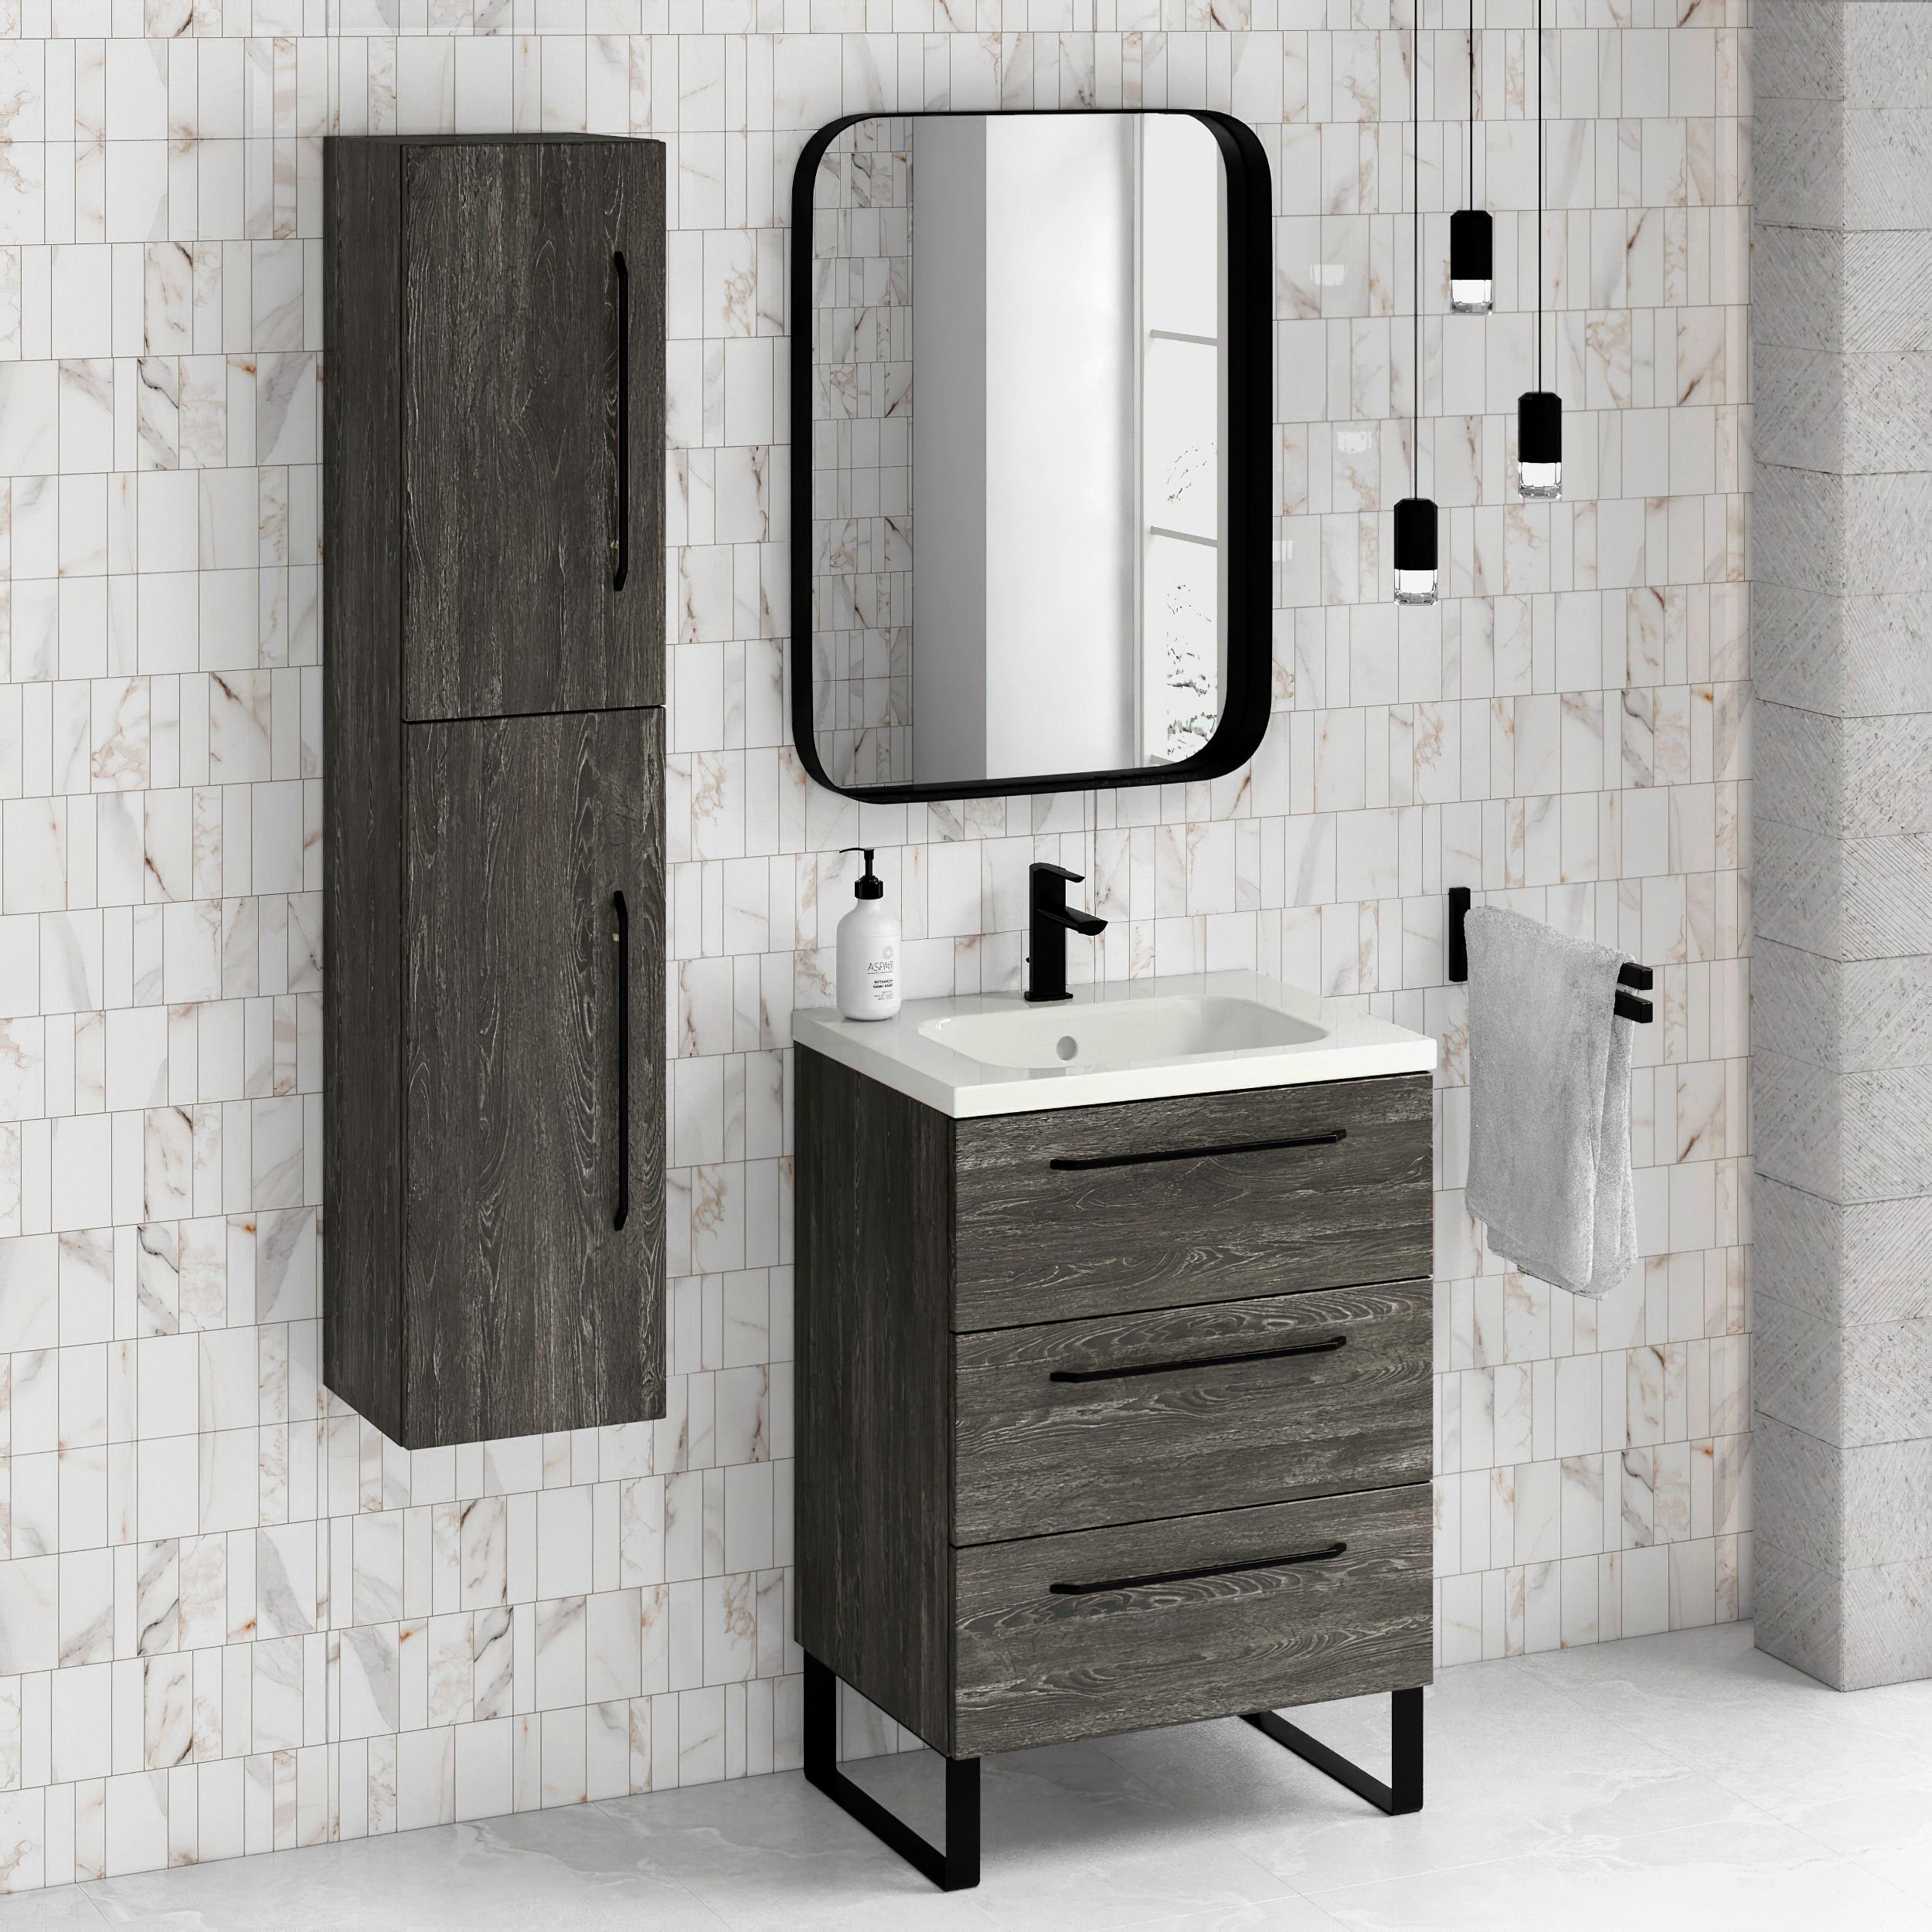 24 Bathroom Vanity Cabinet Ceramic Sink Set Denver W 24 X H 35 X D 18 In Wf446 Charred Oak On Sale Overstock 31647931